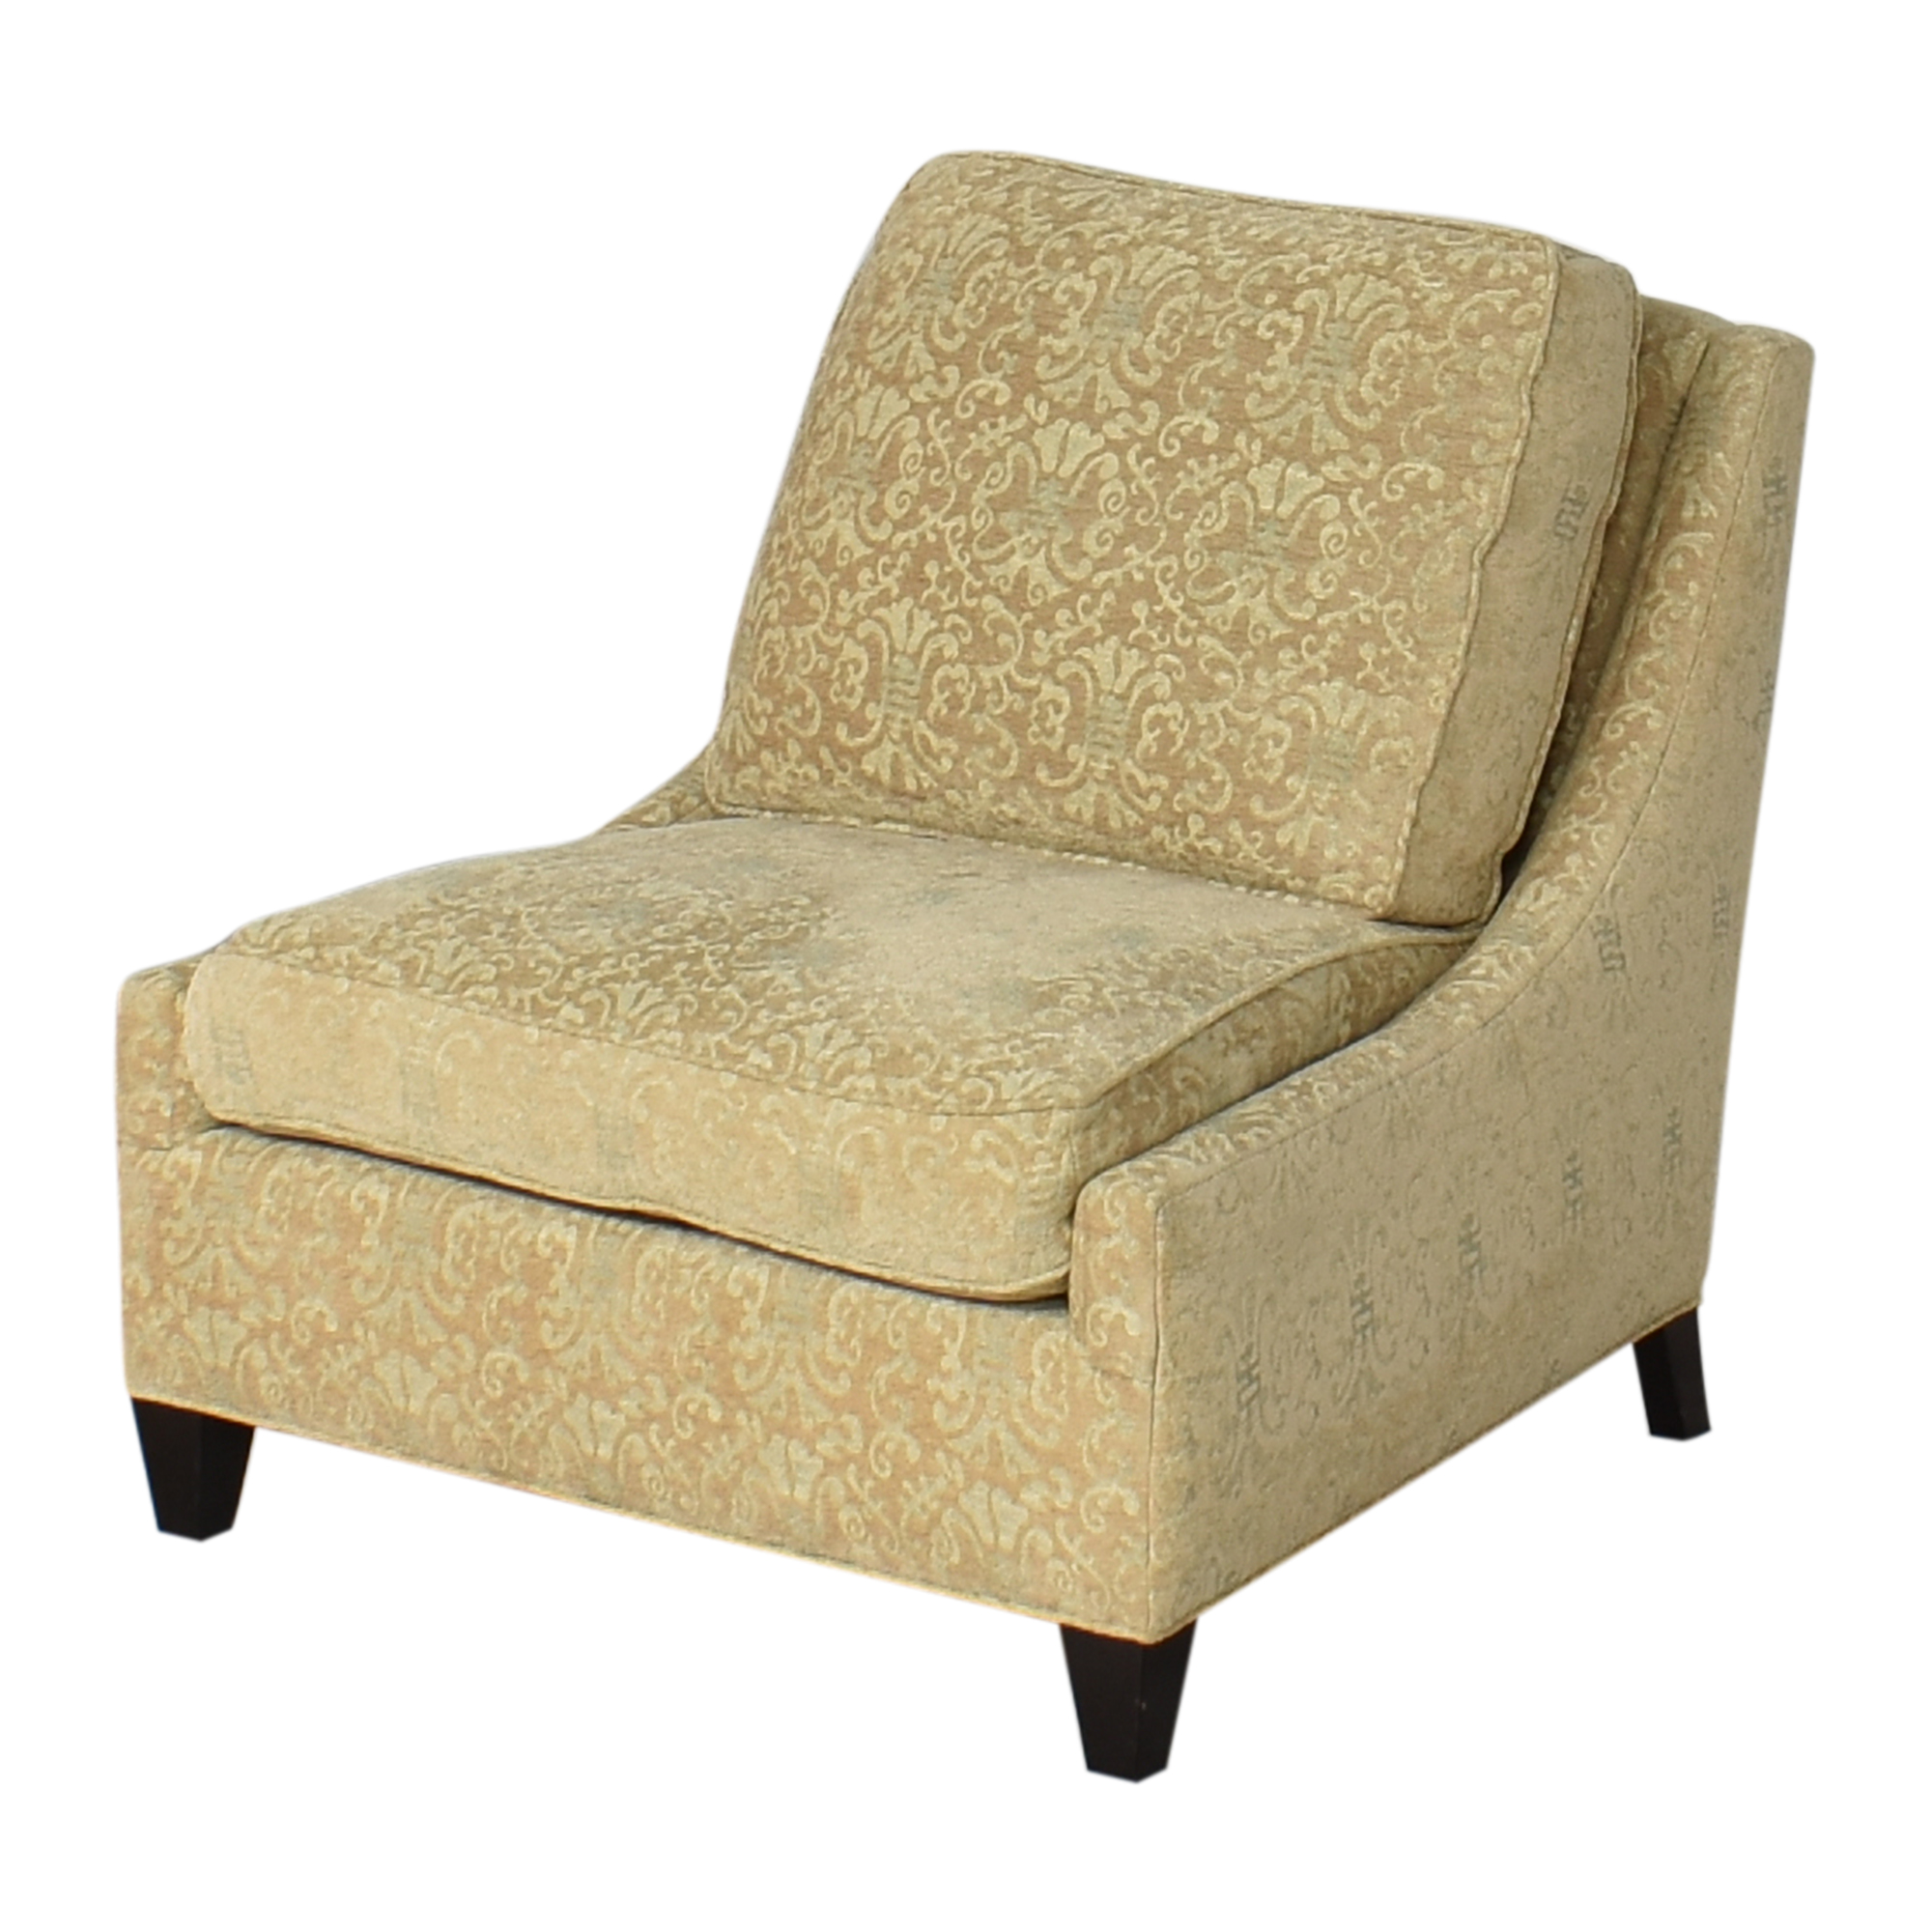 Stewart Furniture Stewart Furniture Slipper Chair ma